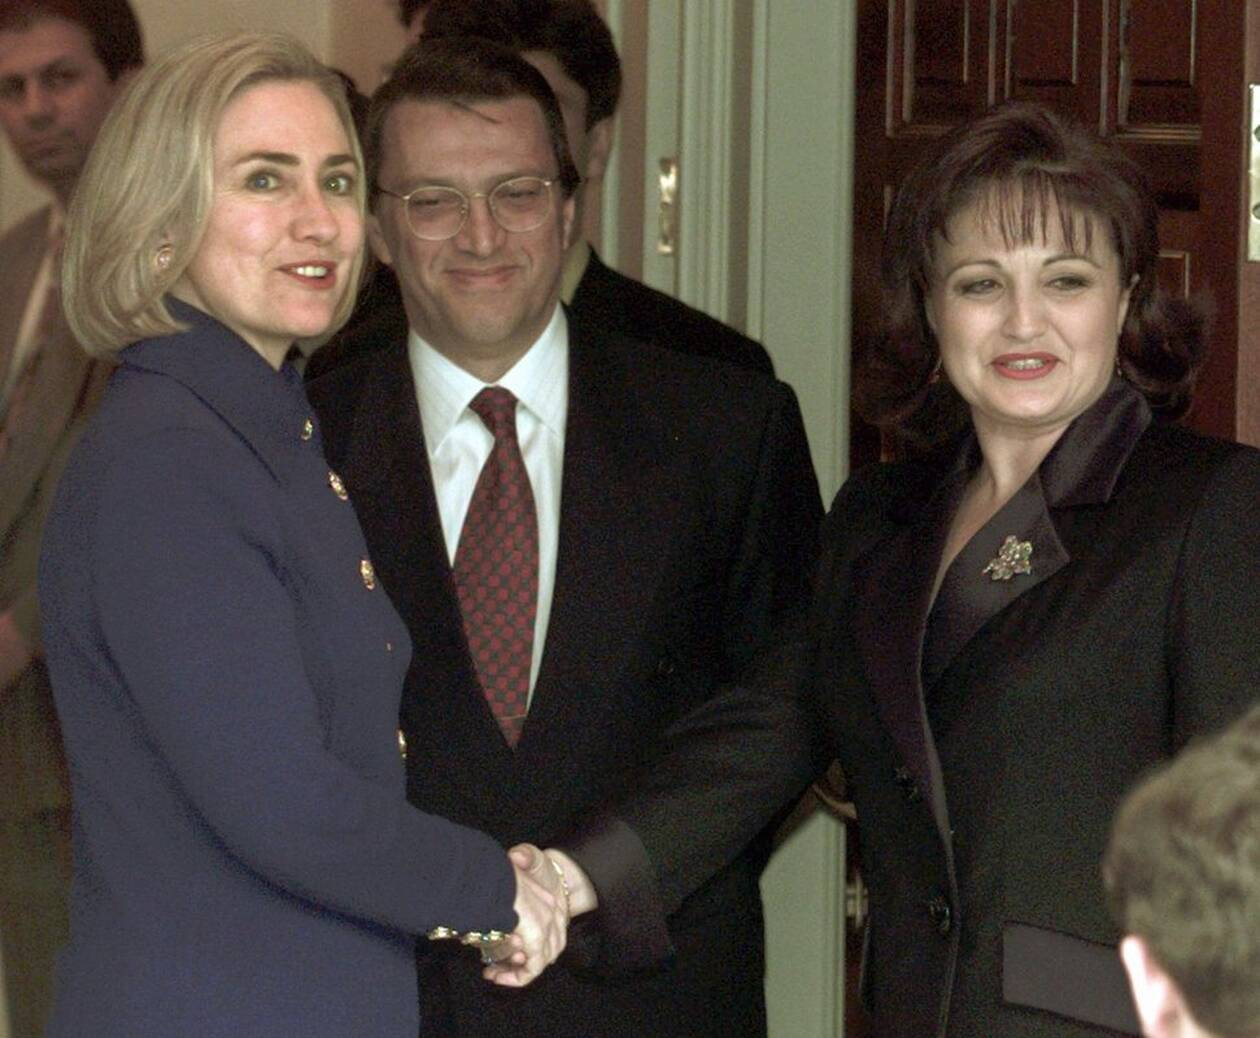 https://cdn.cnngreece.gr/media/news/2020/10/30/240586/photos/snapshot/gilmaz_mesut_tourkia-11.jpg